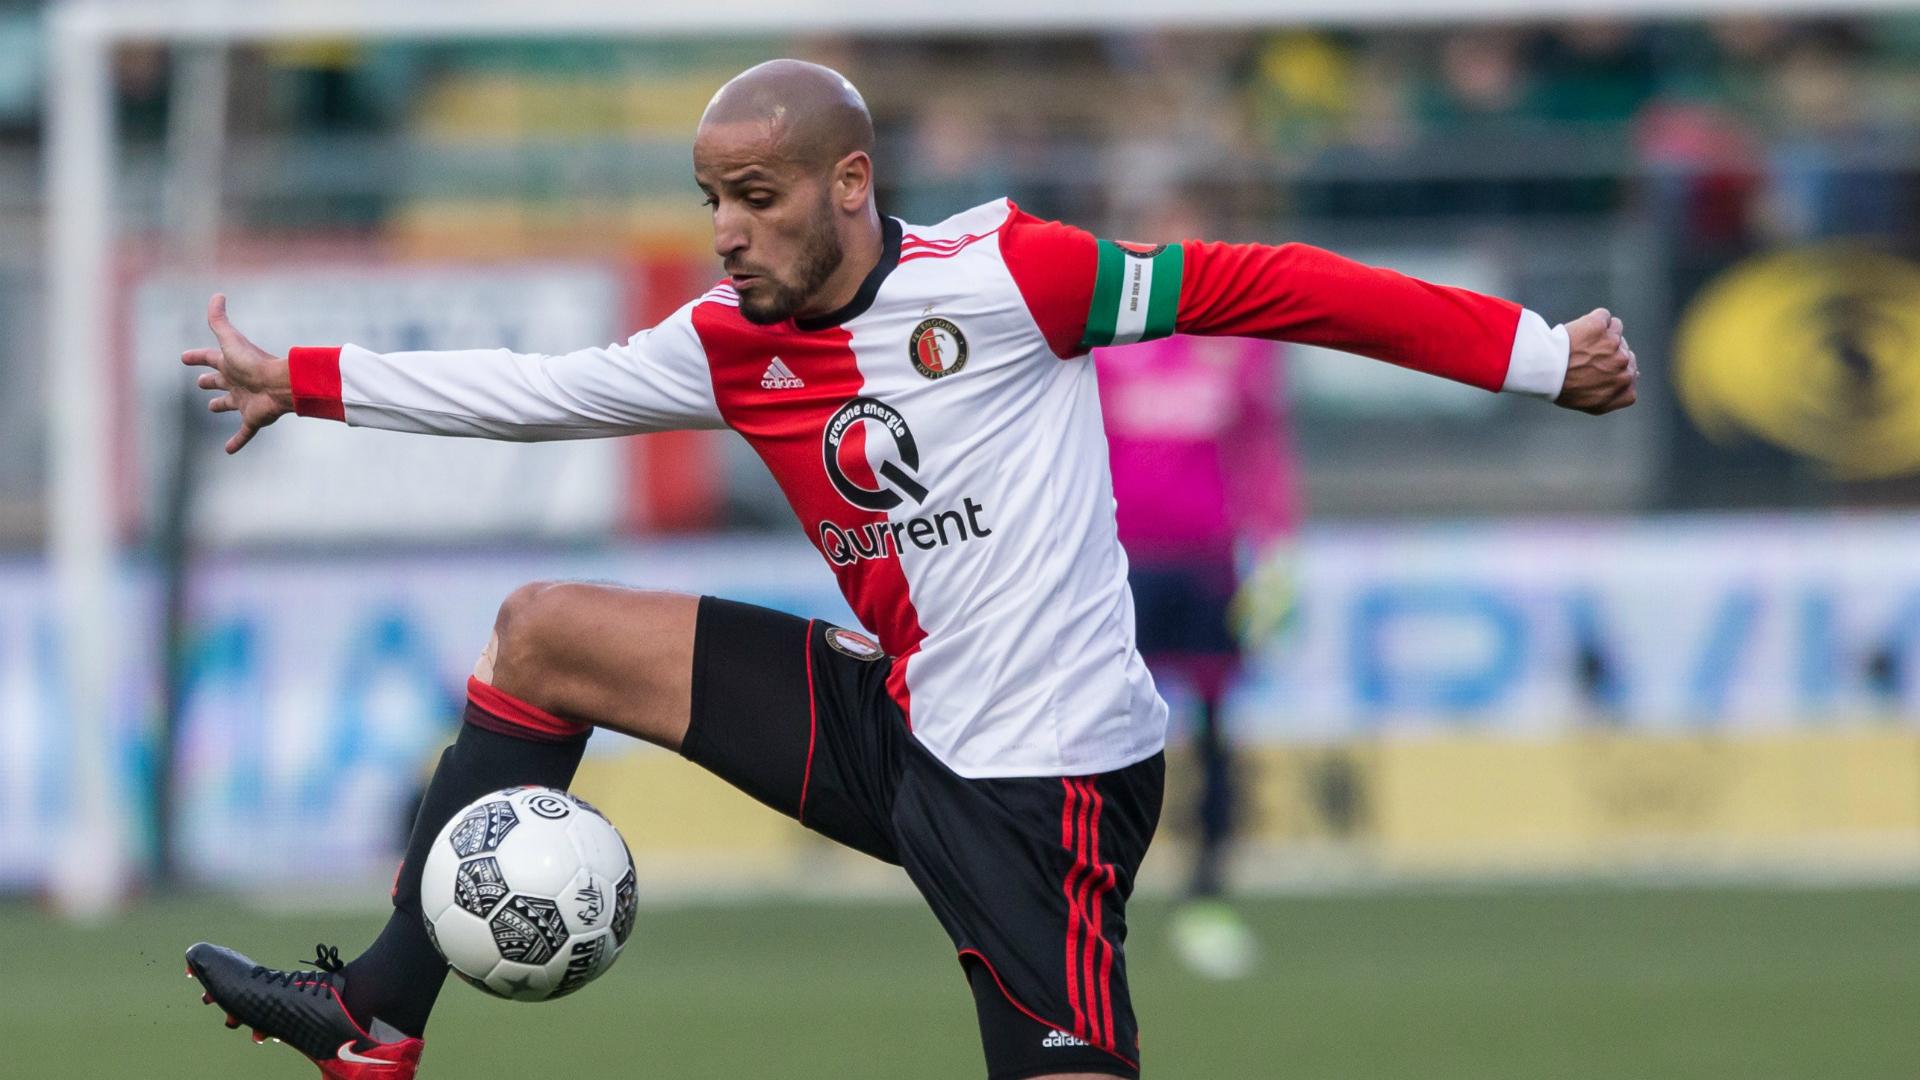 Karim El Ahmadi, ADO - Feyenoord, 11052017